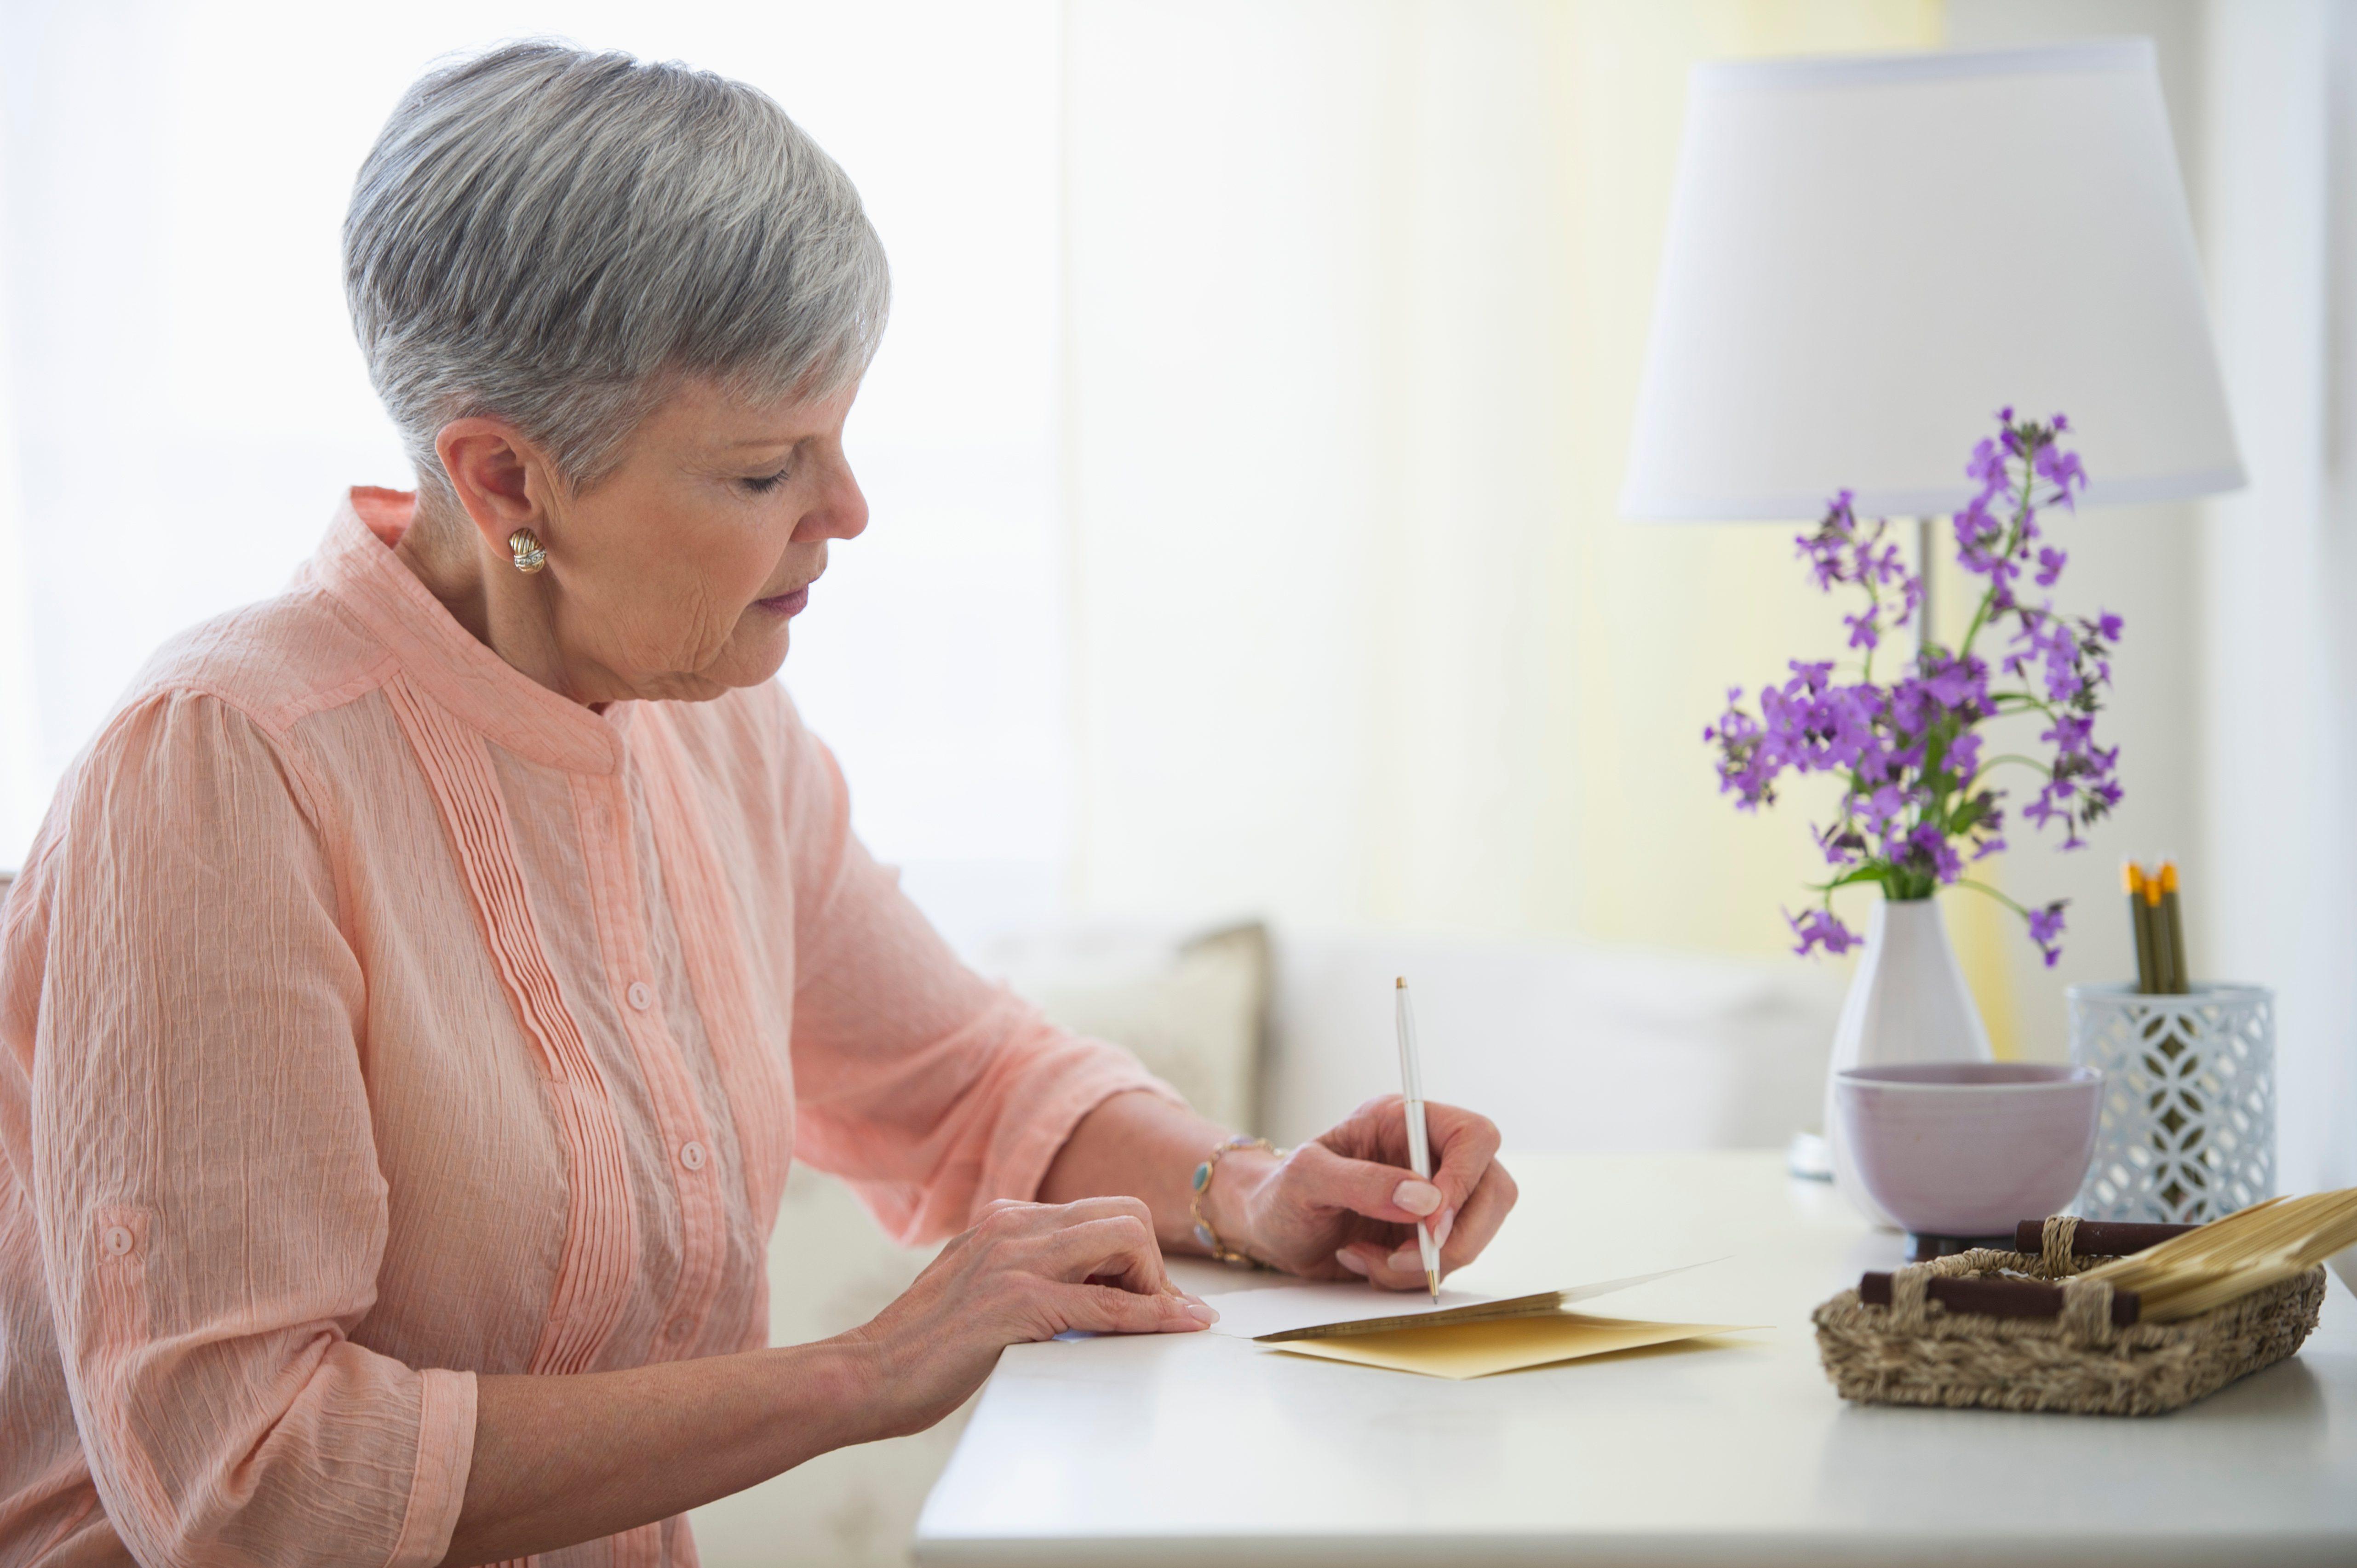 USA, New Jersey, Jersey City, Senior woman writing letter